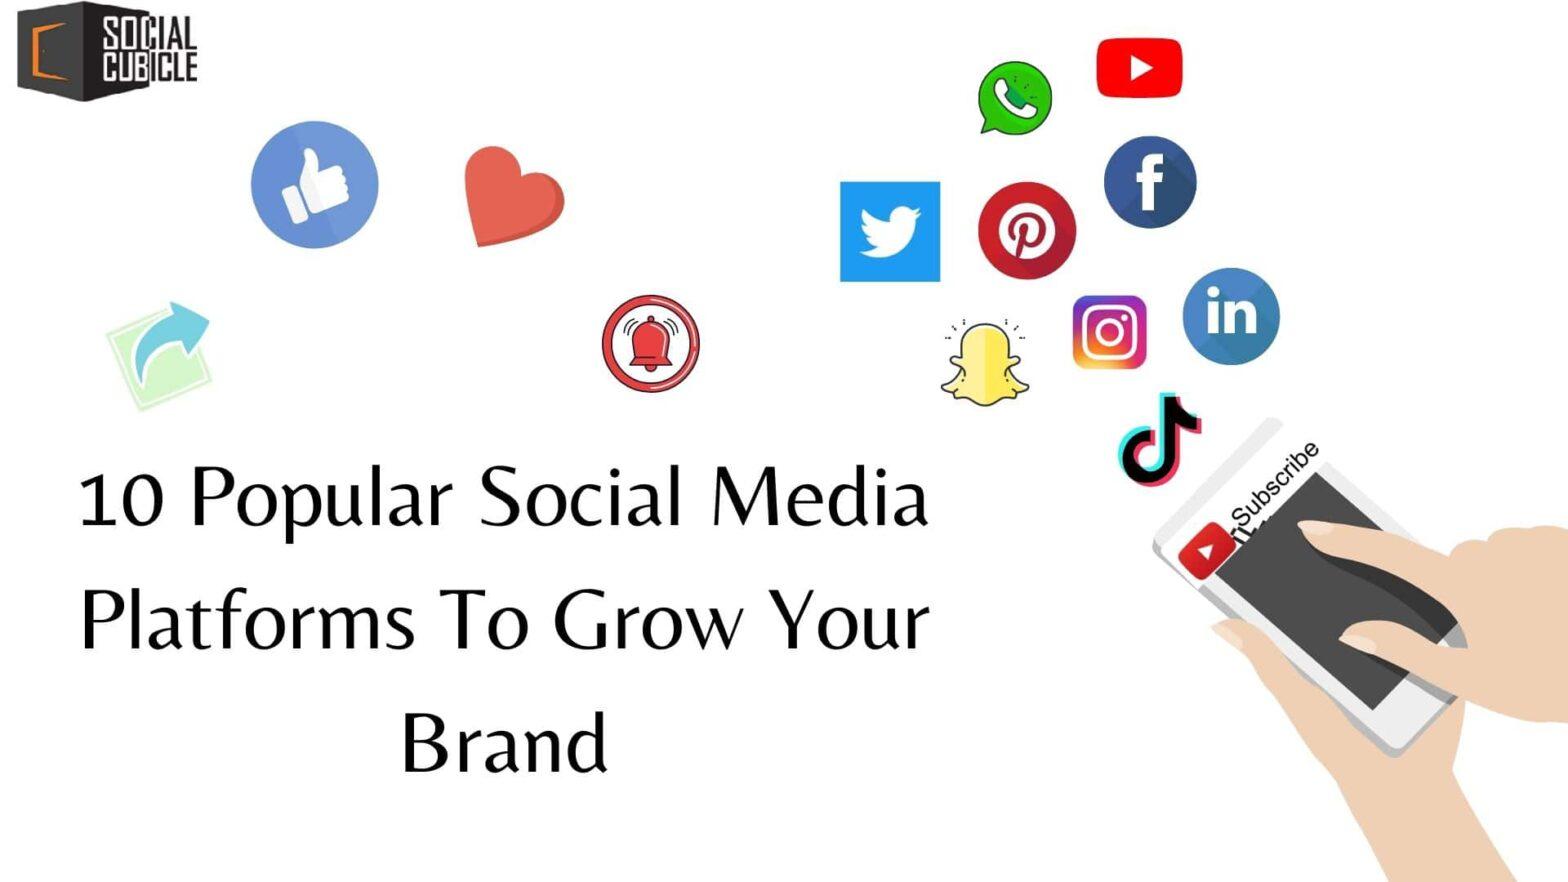 Social Media Platforms for brands